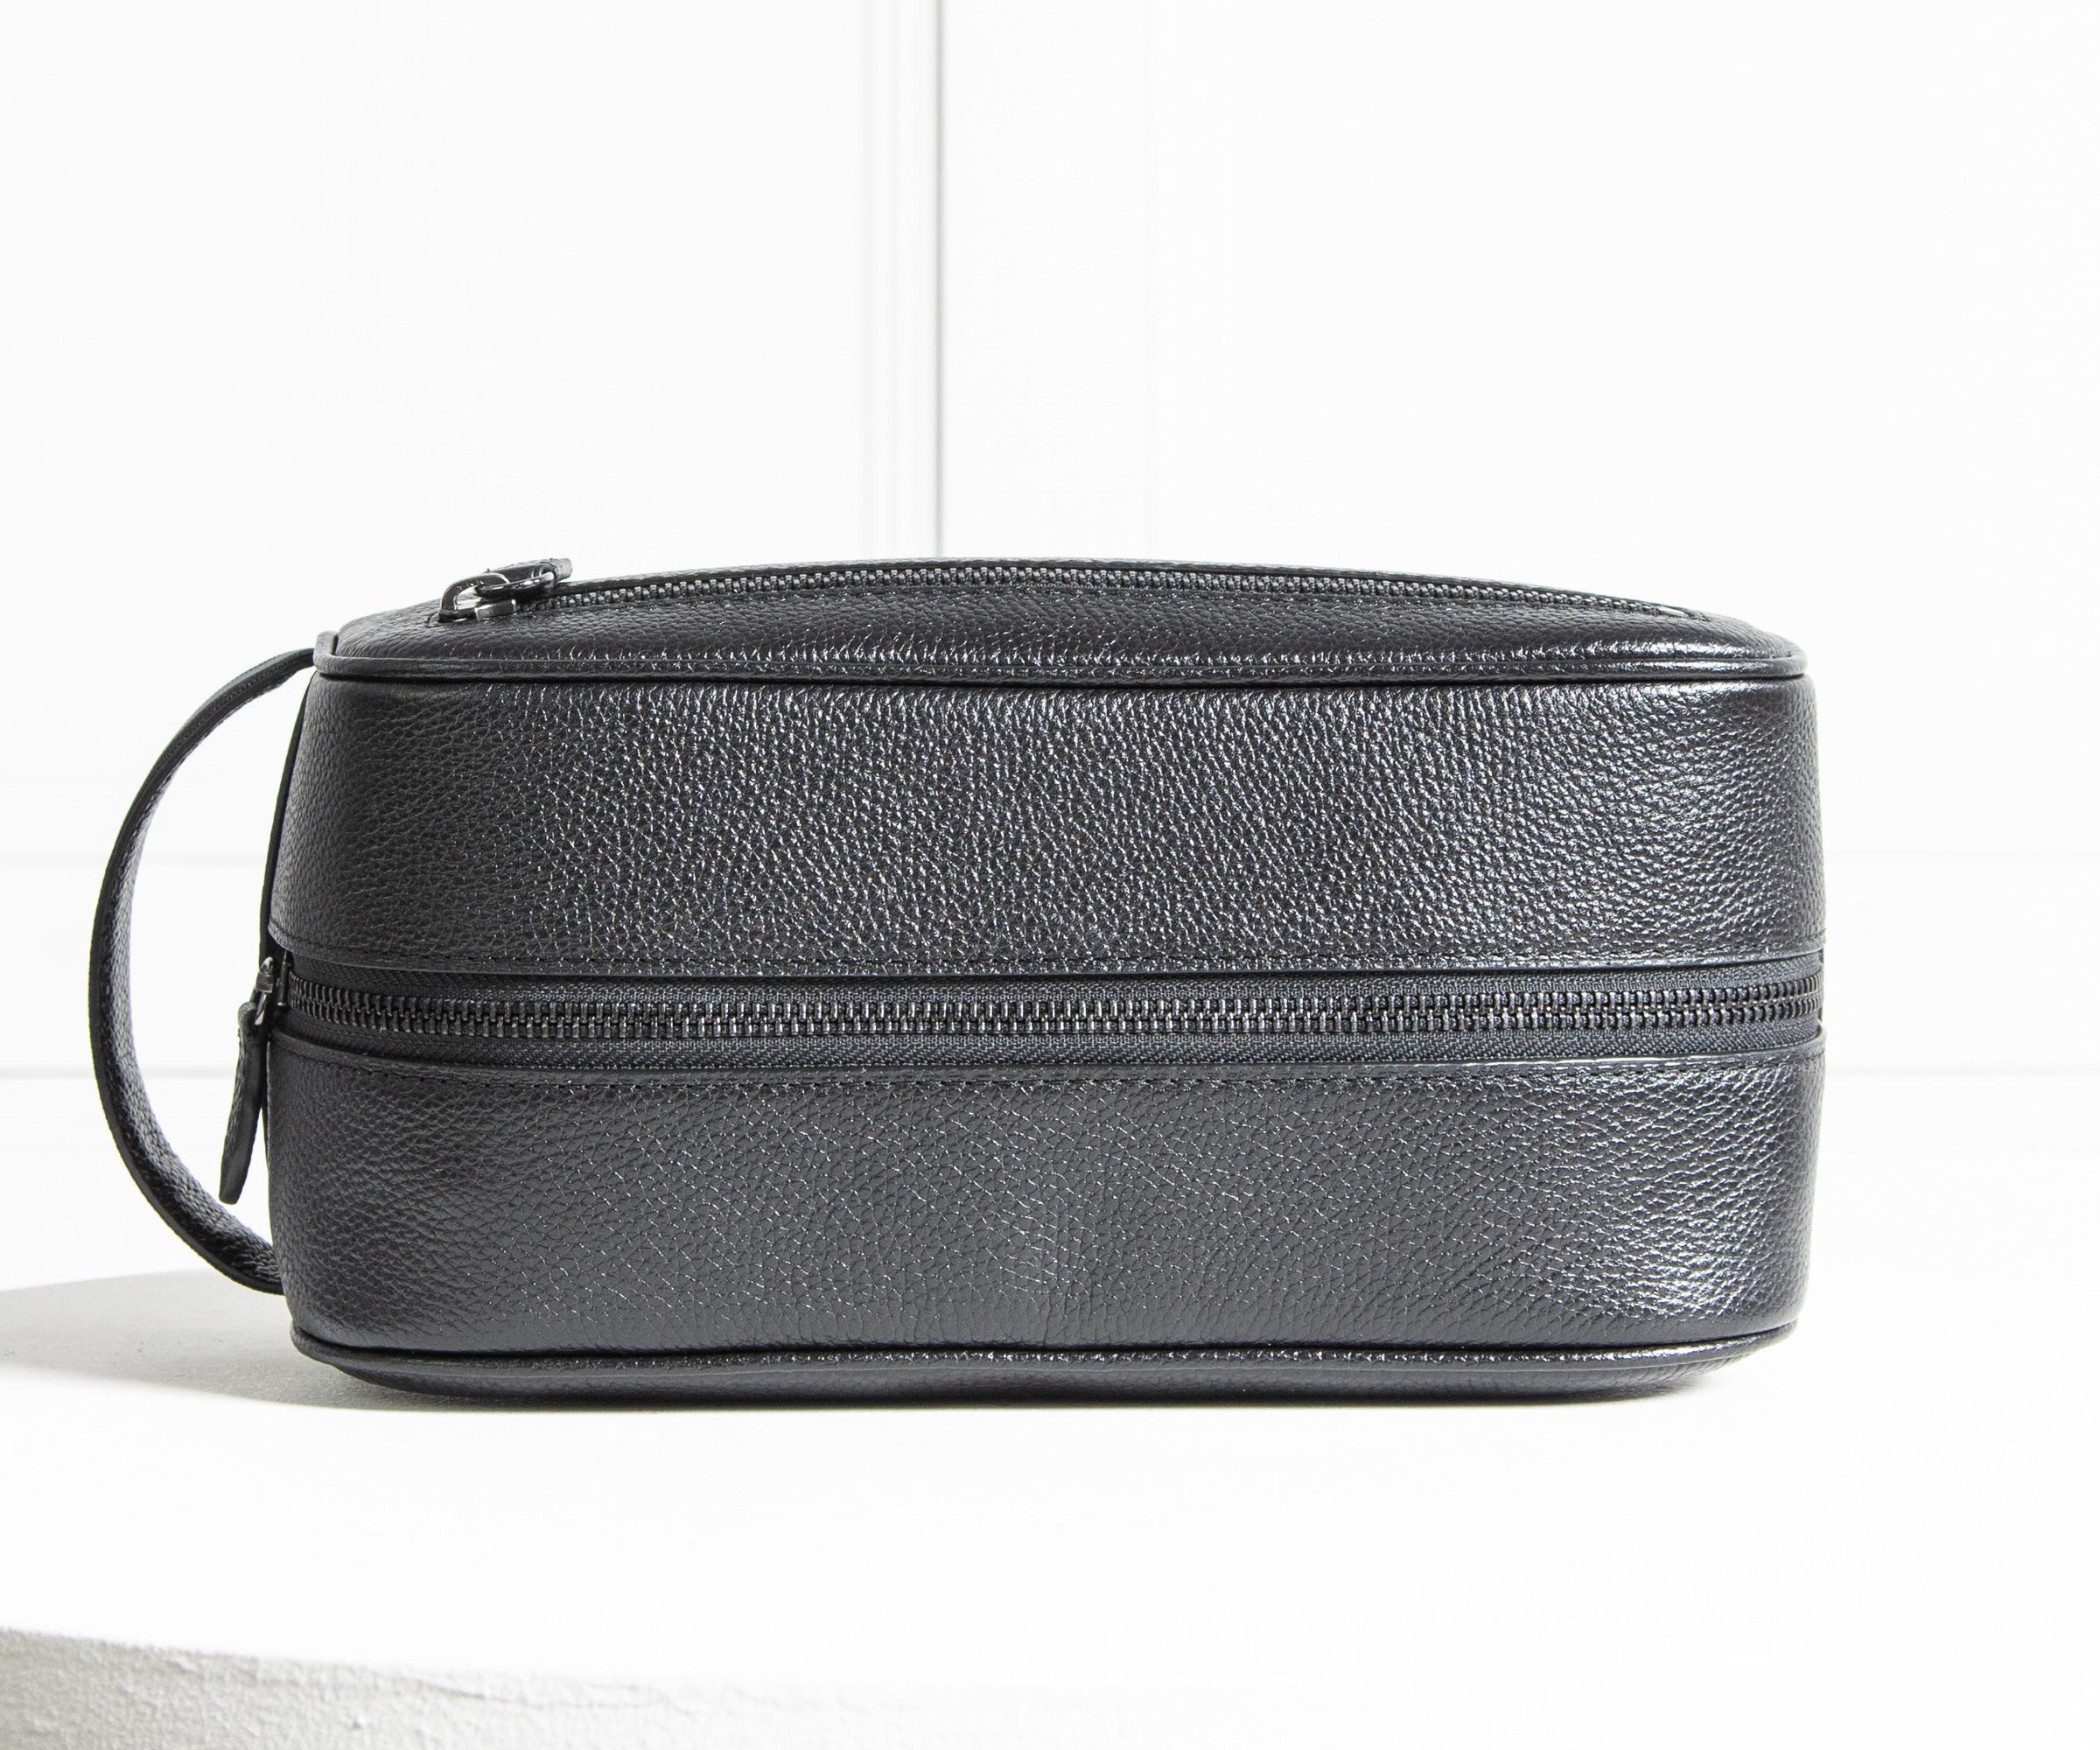 035d0156bb2b Lyst - Polo Ralph Lauren Leather Wash Bag Black in Black for Men